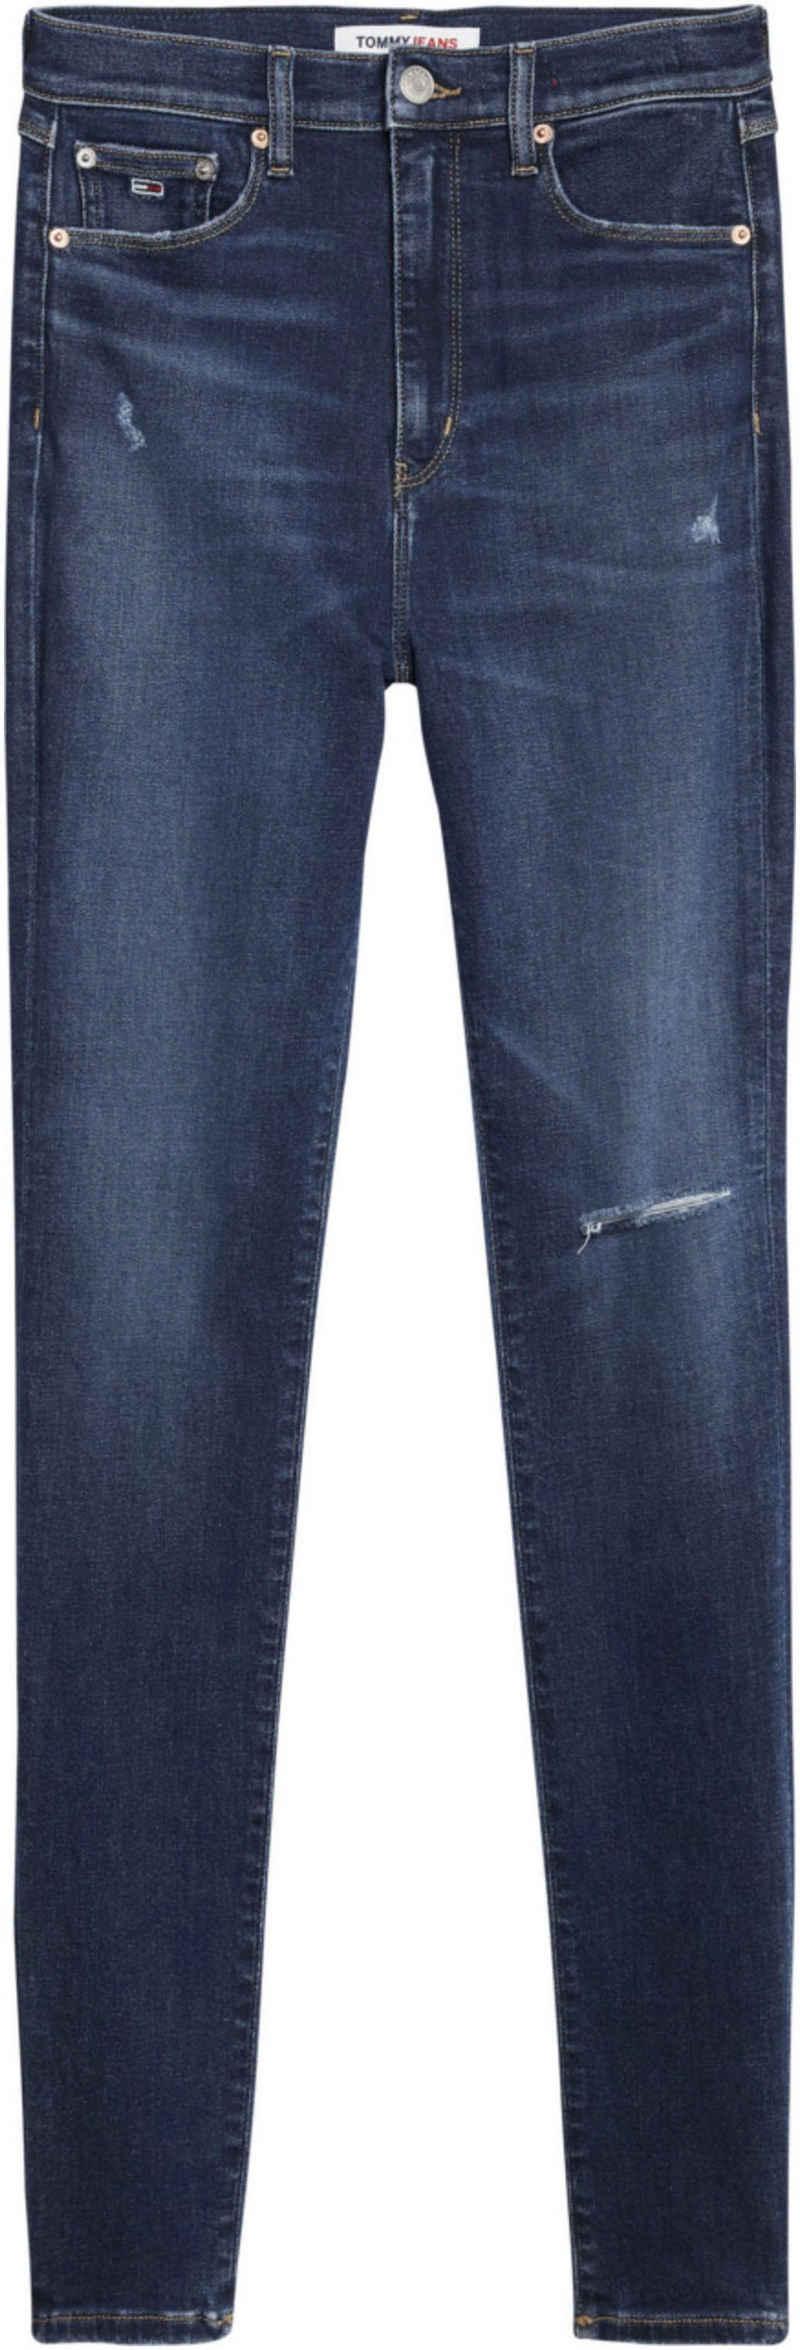 Tommy Jeans Skinny-fit-Jeans »MELANY UHR SPR SKNY BE654 DBSTD« mit Knee-cut & Tommy Jeans Logo-Badge